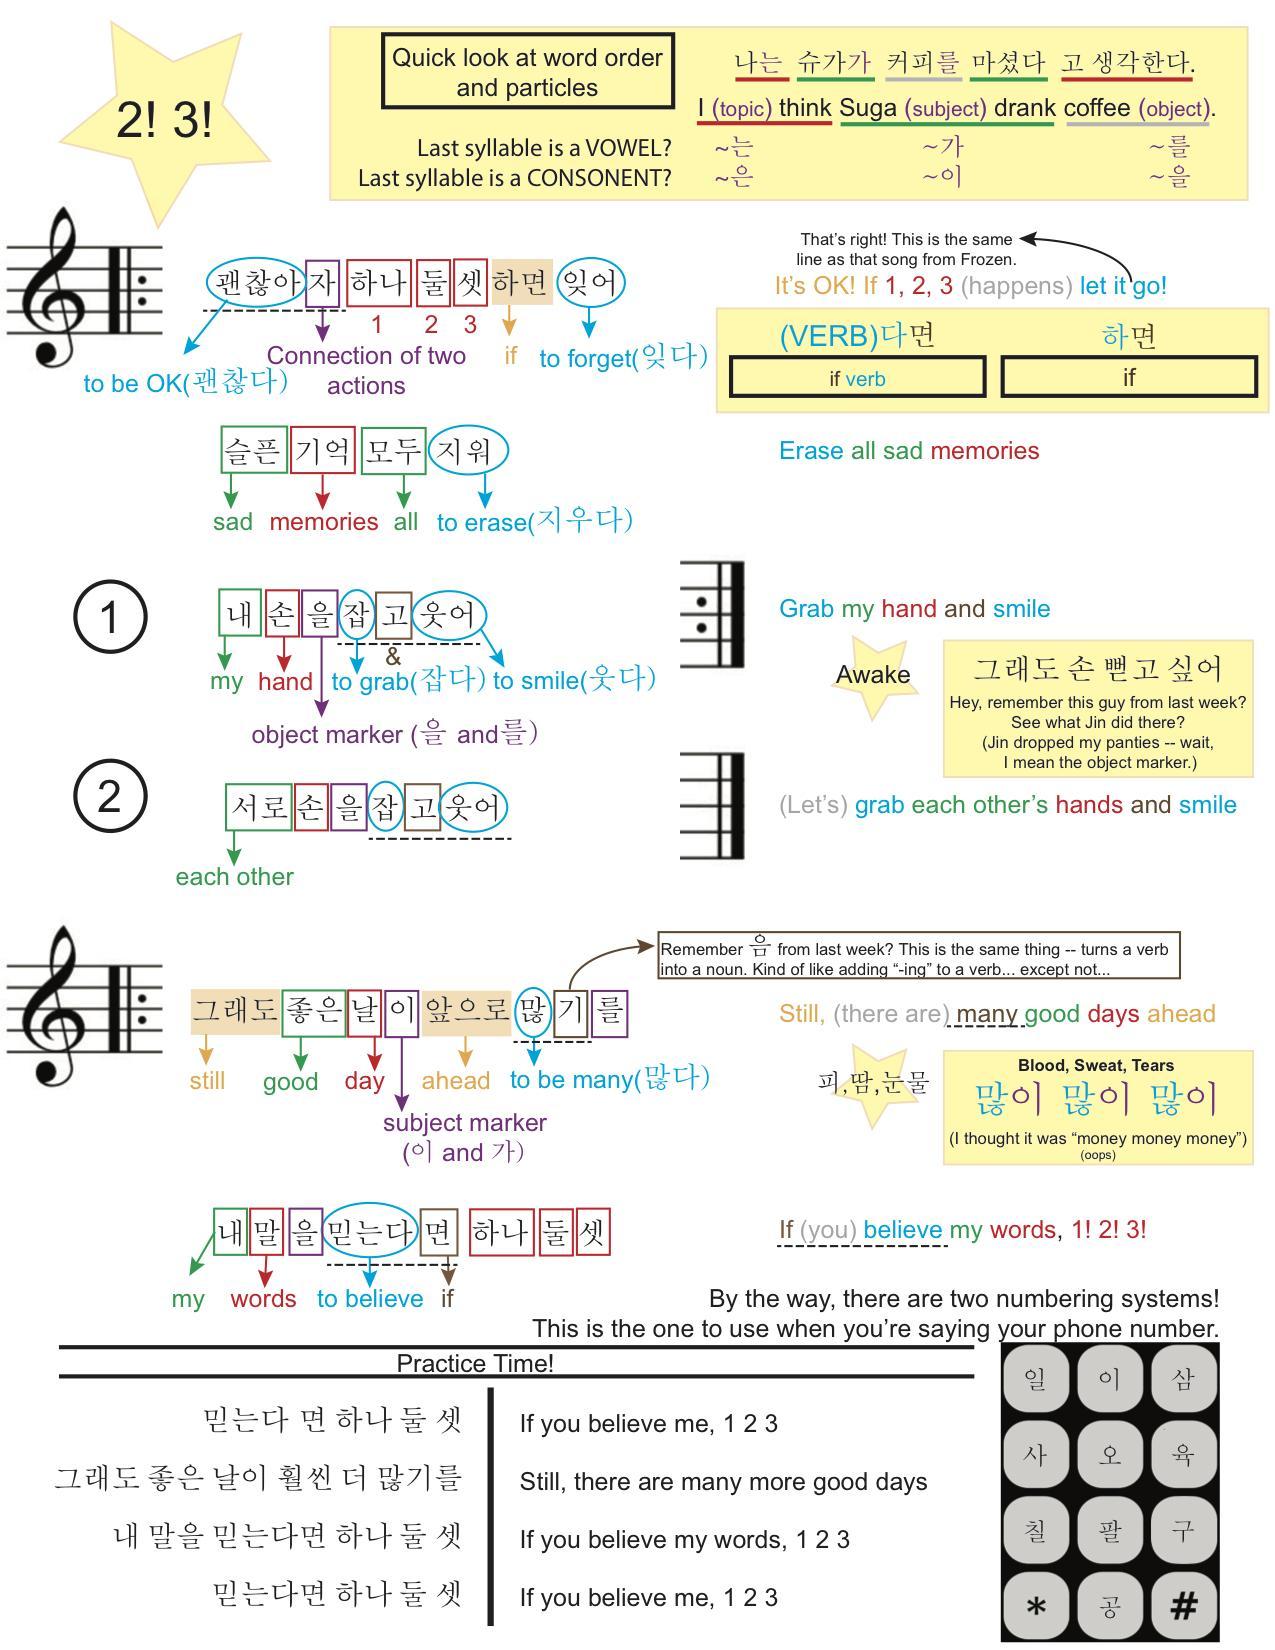 Learn Korean With Bts Lyrics Study Sheet 3 2 3 Bangtan